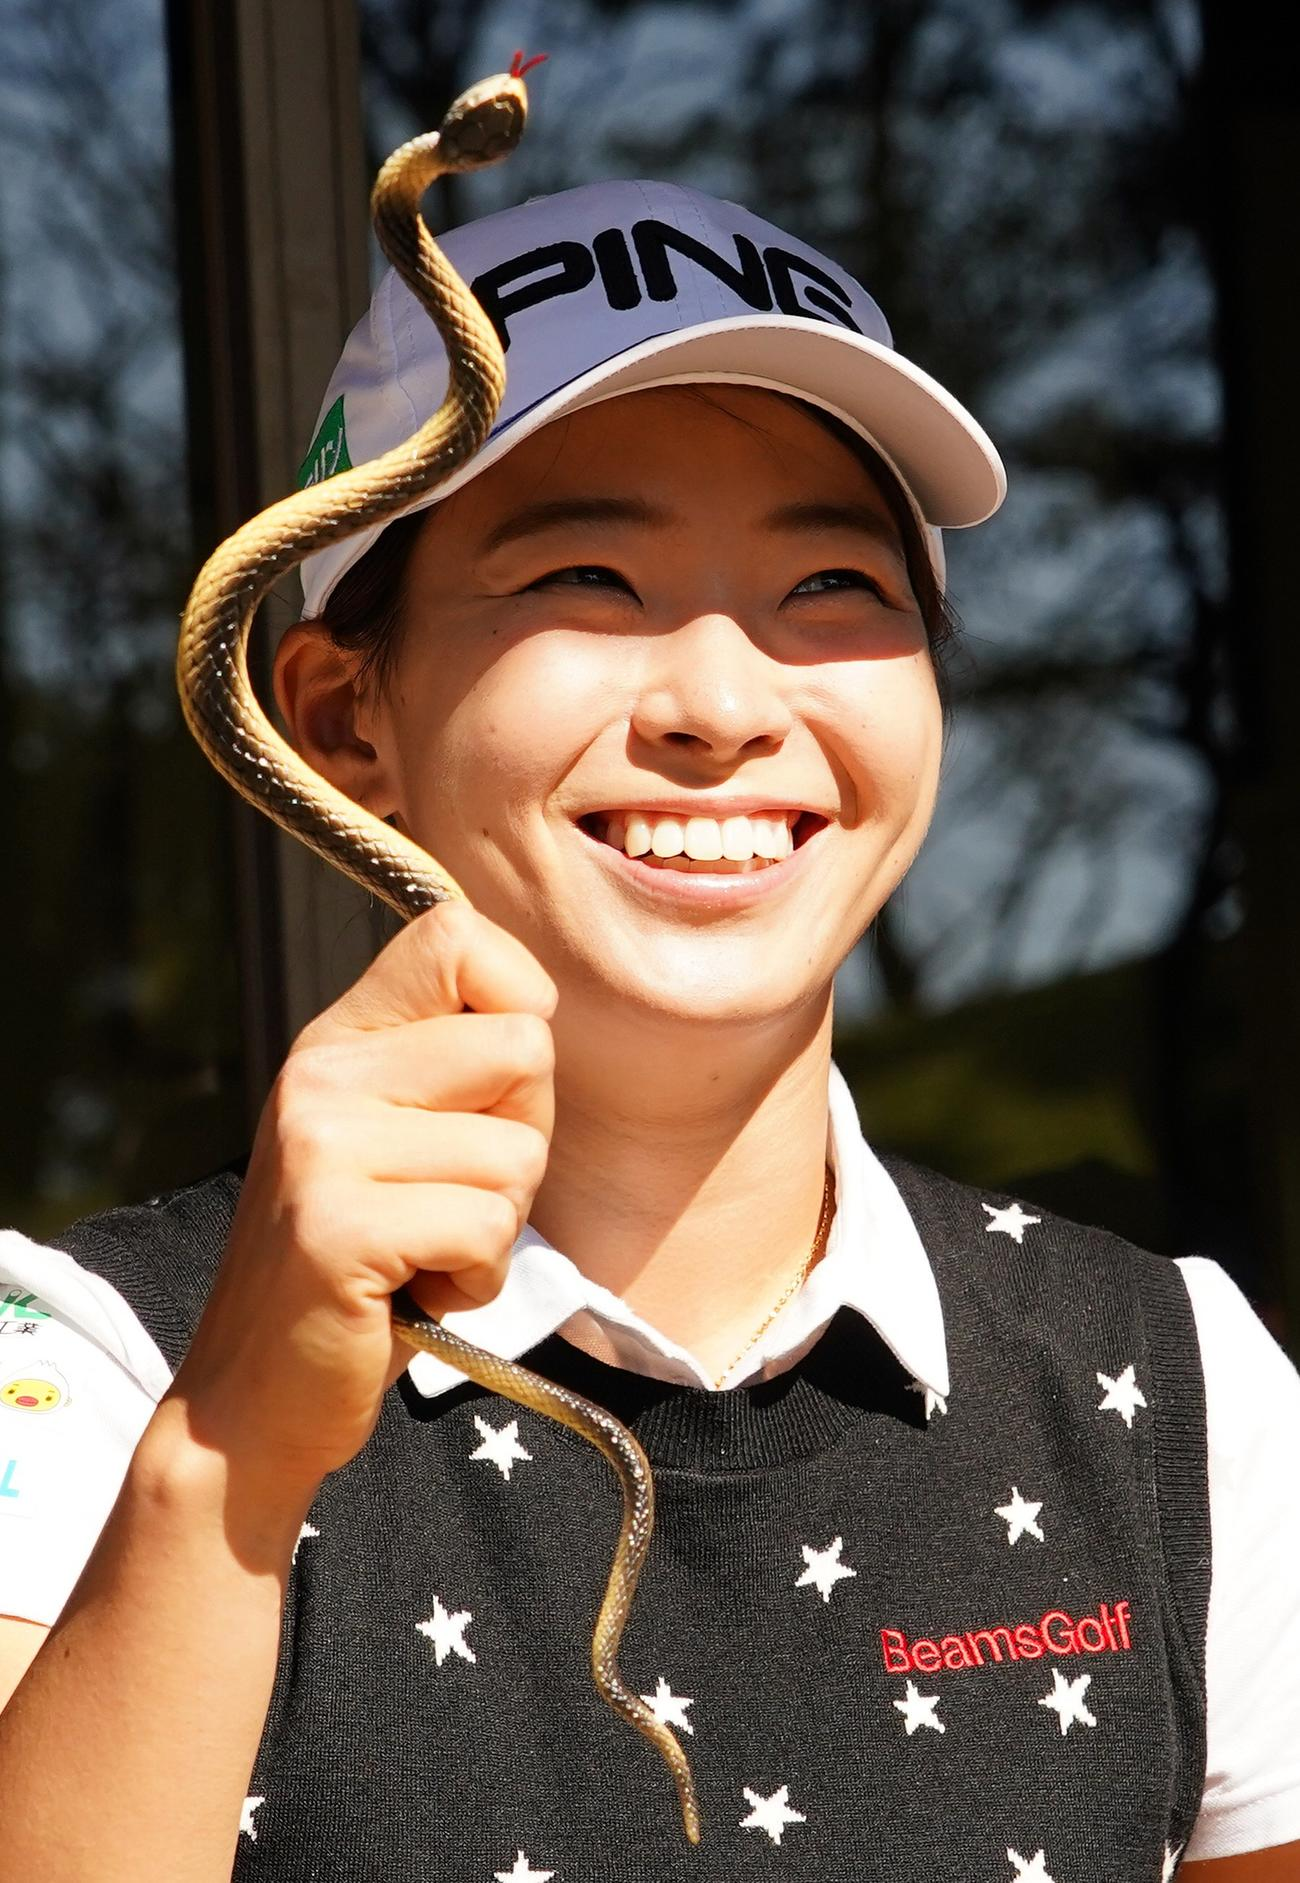 https://www.nikkansports.com/sports/golf/news/img/202010290000411-w1300_1.jpg